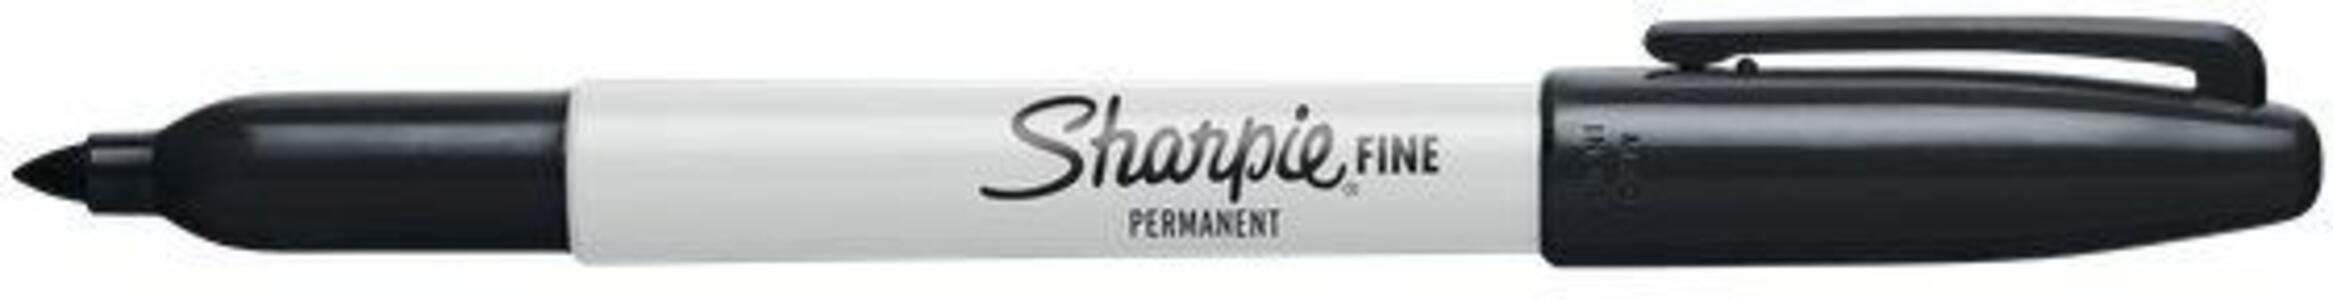 Marcatore permanente Sharpie fine nero punta tonda 1 mm